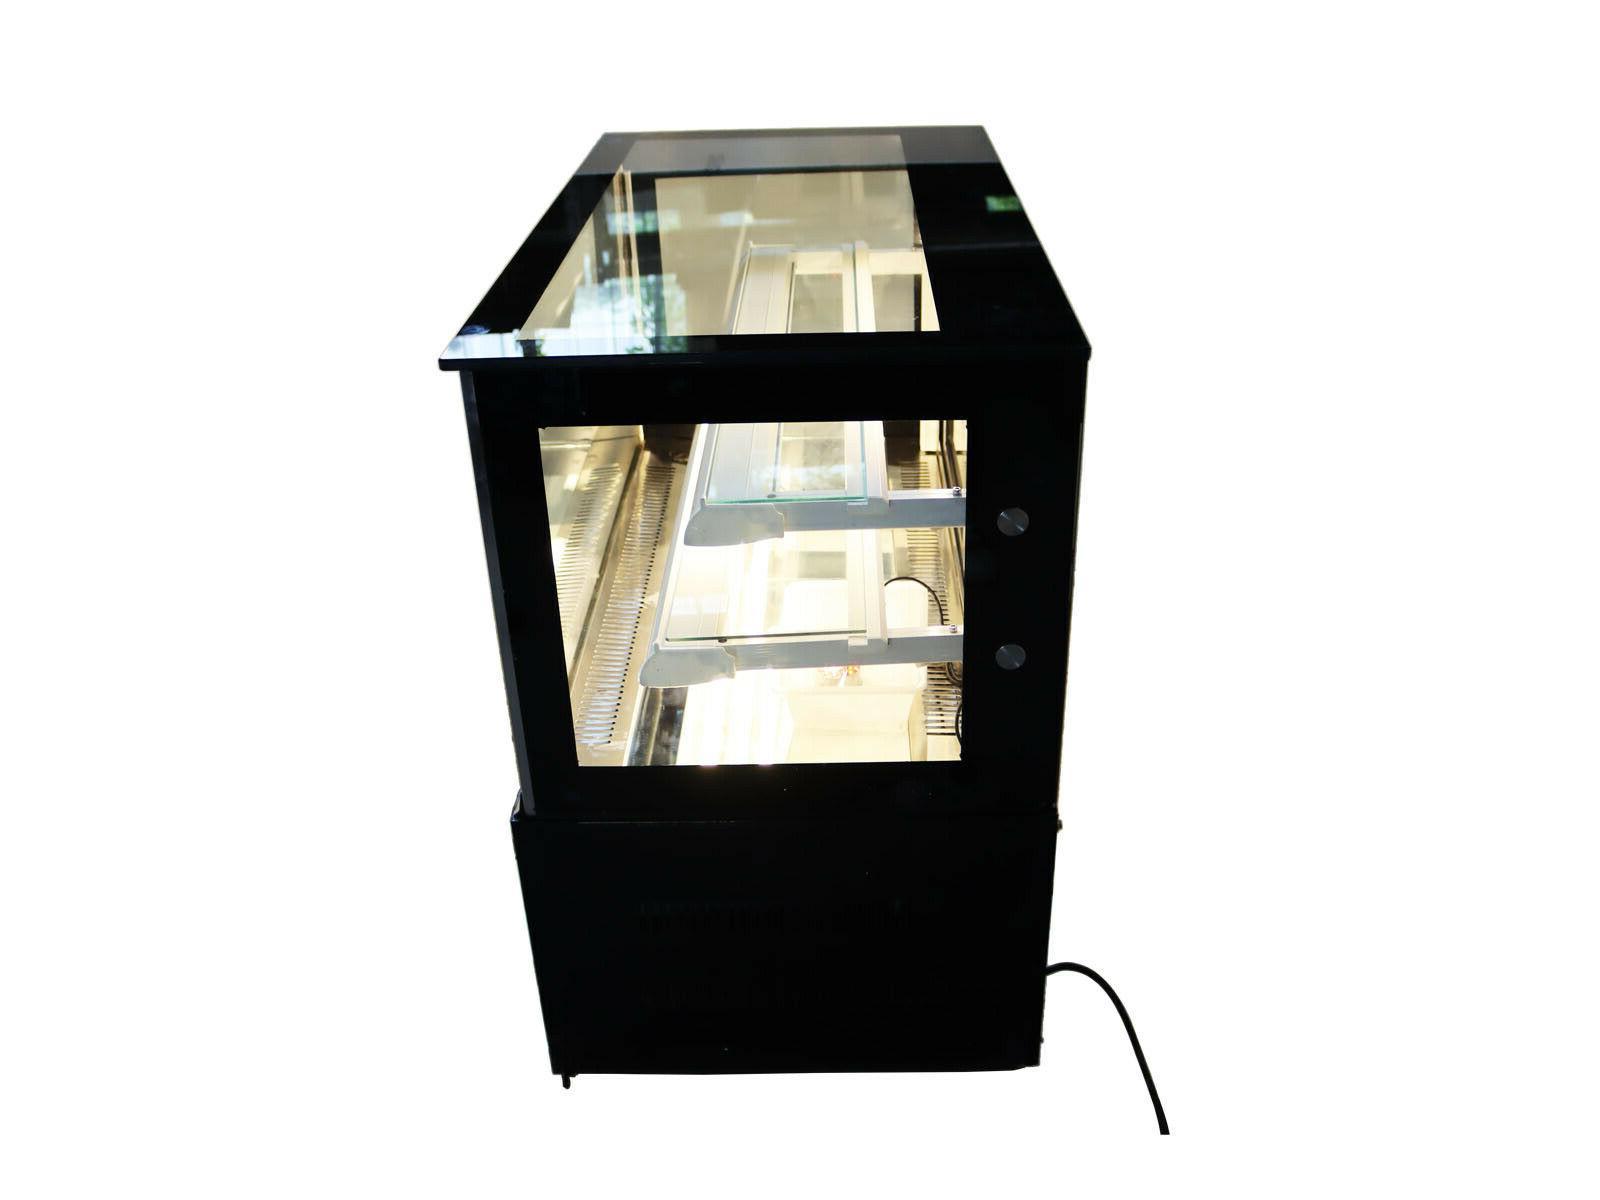 newest refrigerated bakery showcase 220v standard configurat